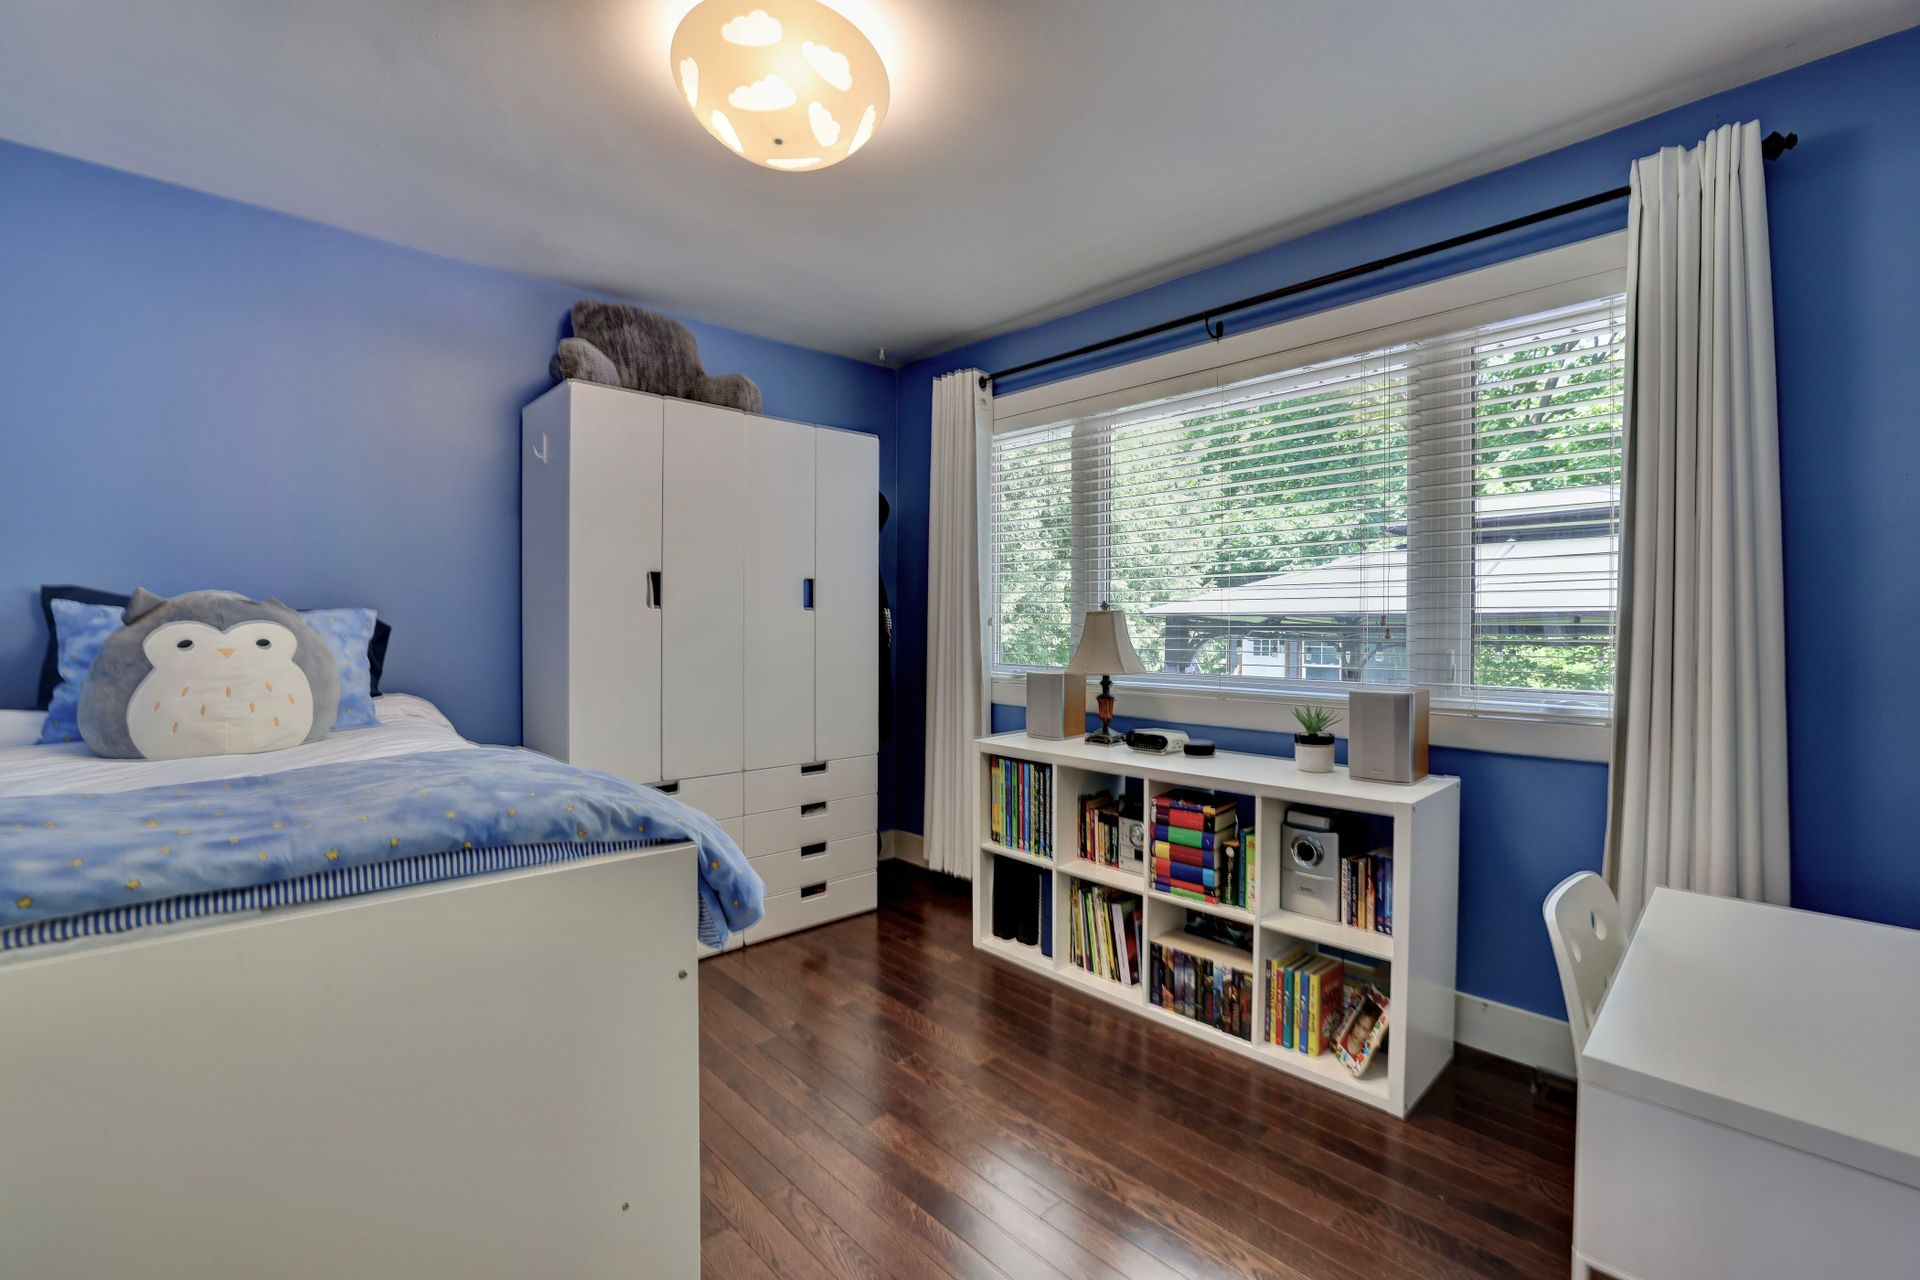 249-lakeview-ave-burlington-bedroom-3 at 249 Lakeview Ave, Burlington,